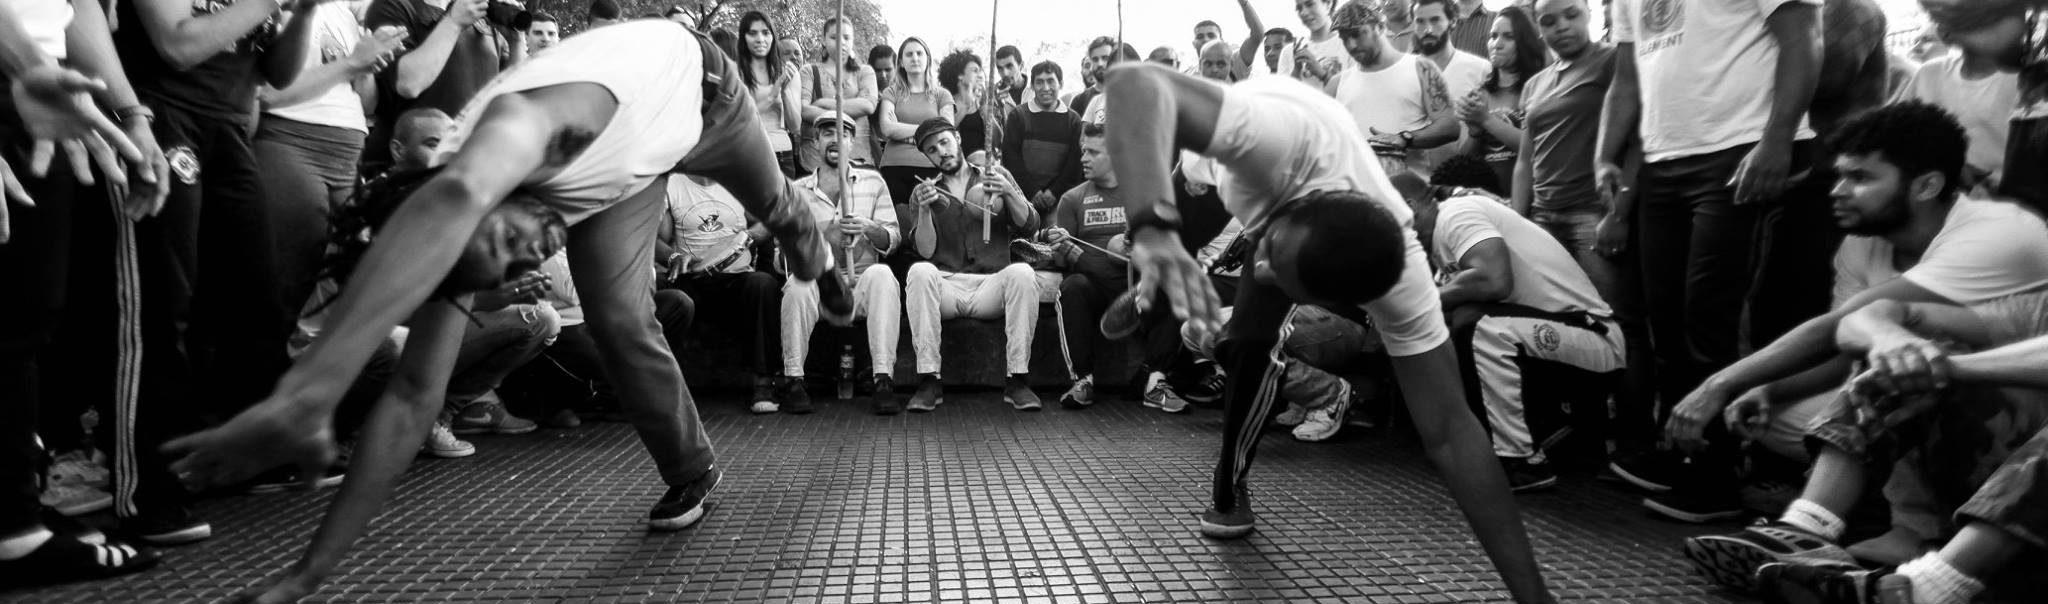 Log in to CapoeiraViva.net